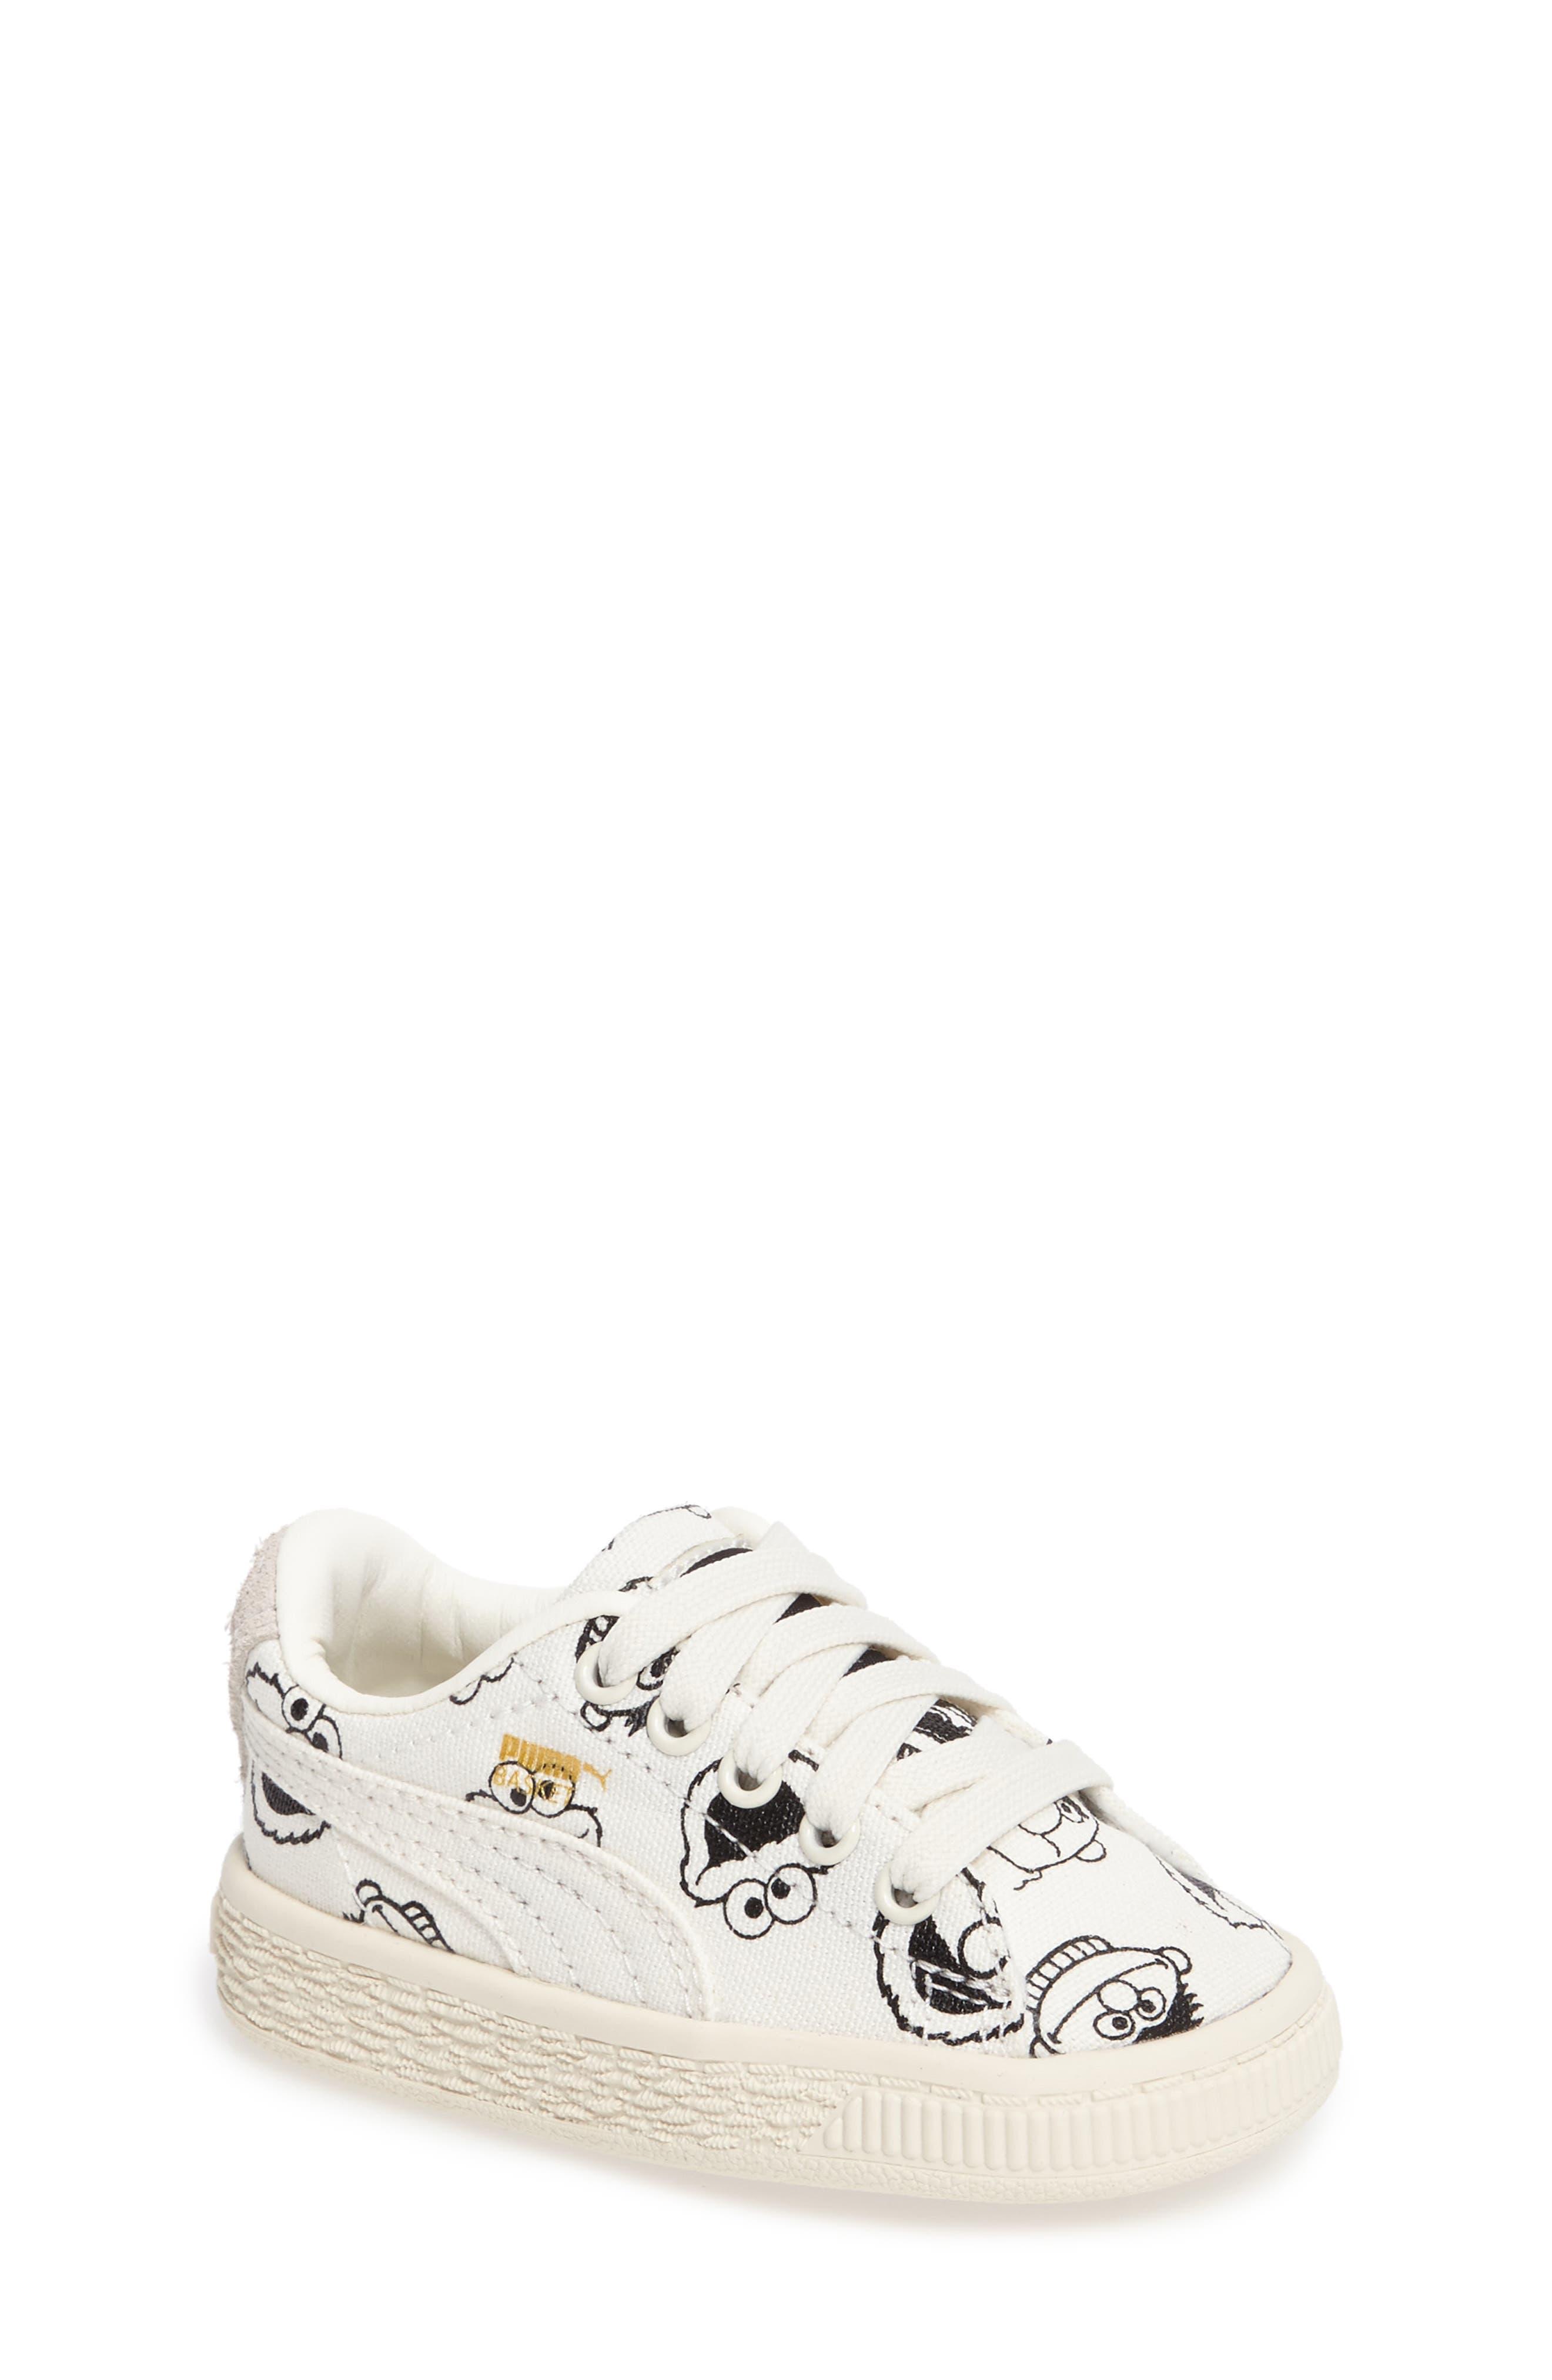 PUMA x Sesame Street<sup>®</sup> Faces Sneaker, Main, color, 100